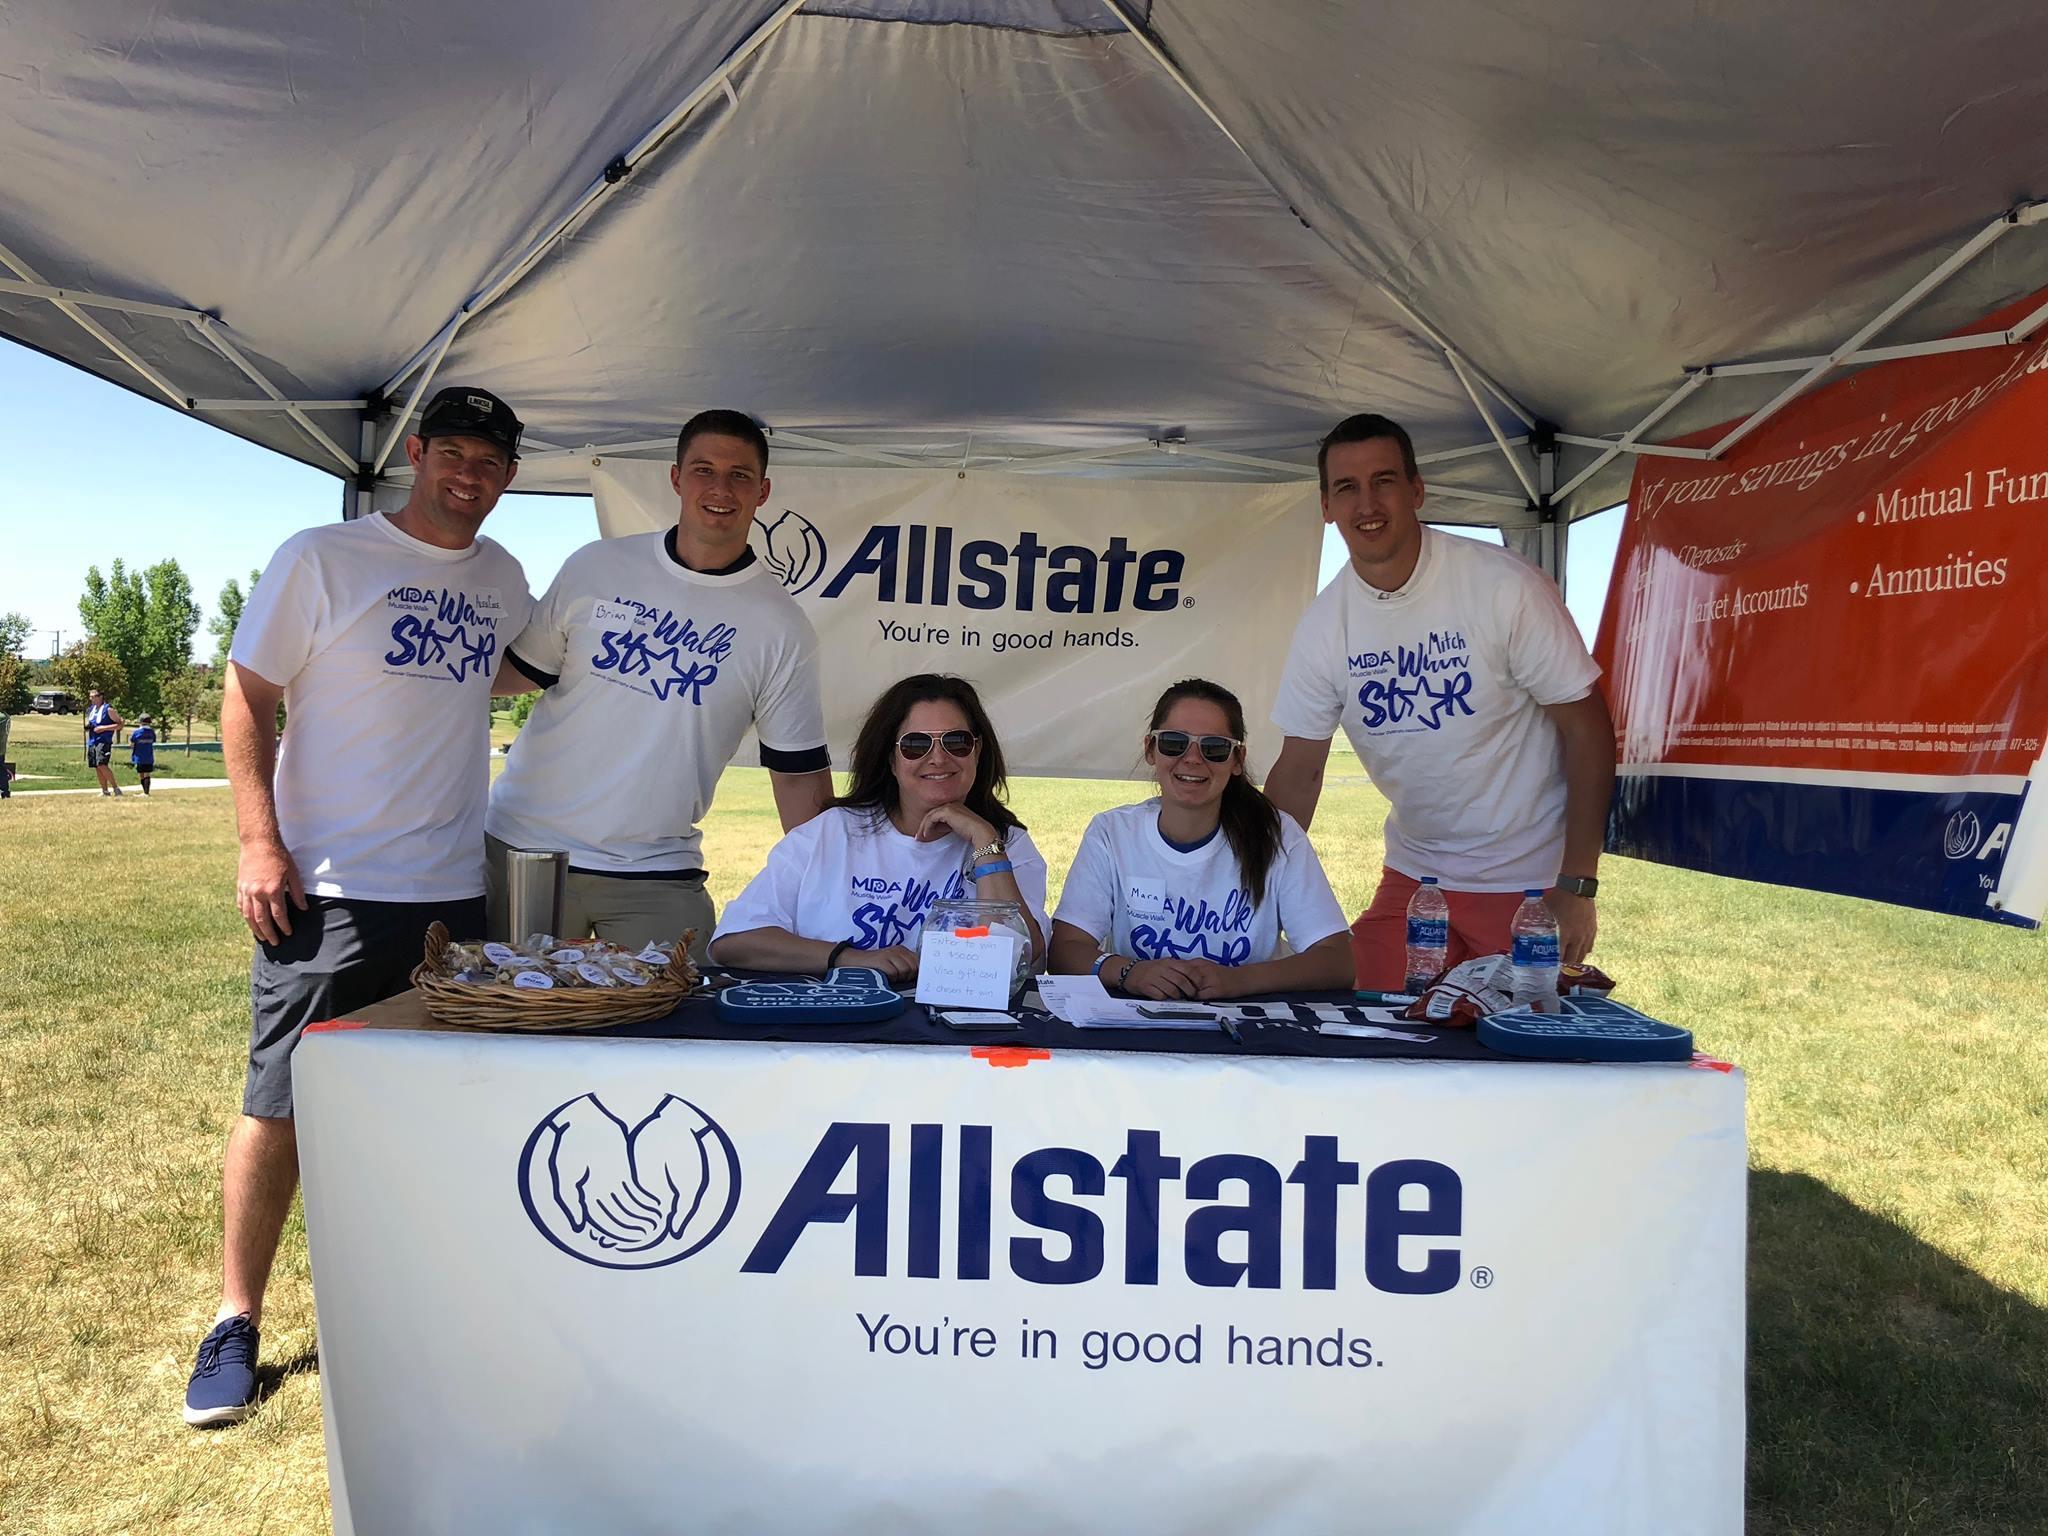 Brian Weatherman: Allstate Insurance image 15